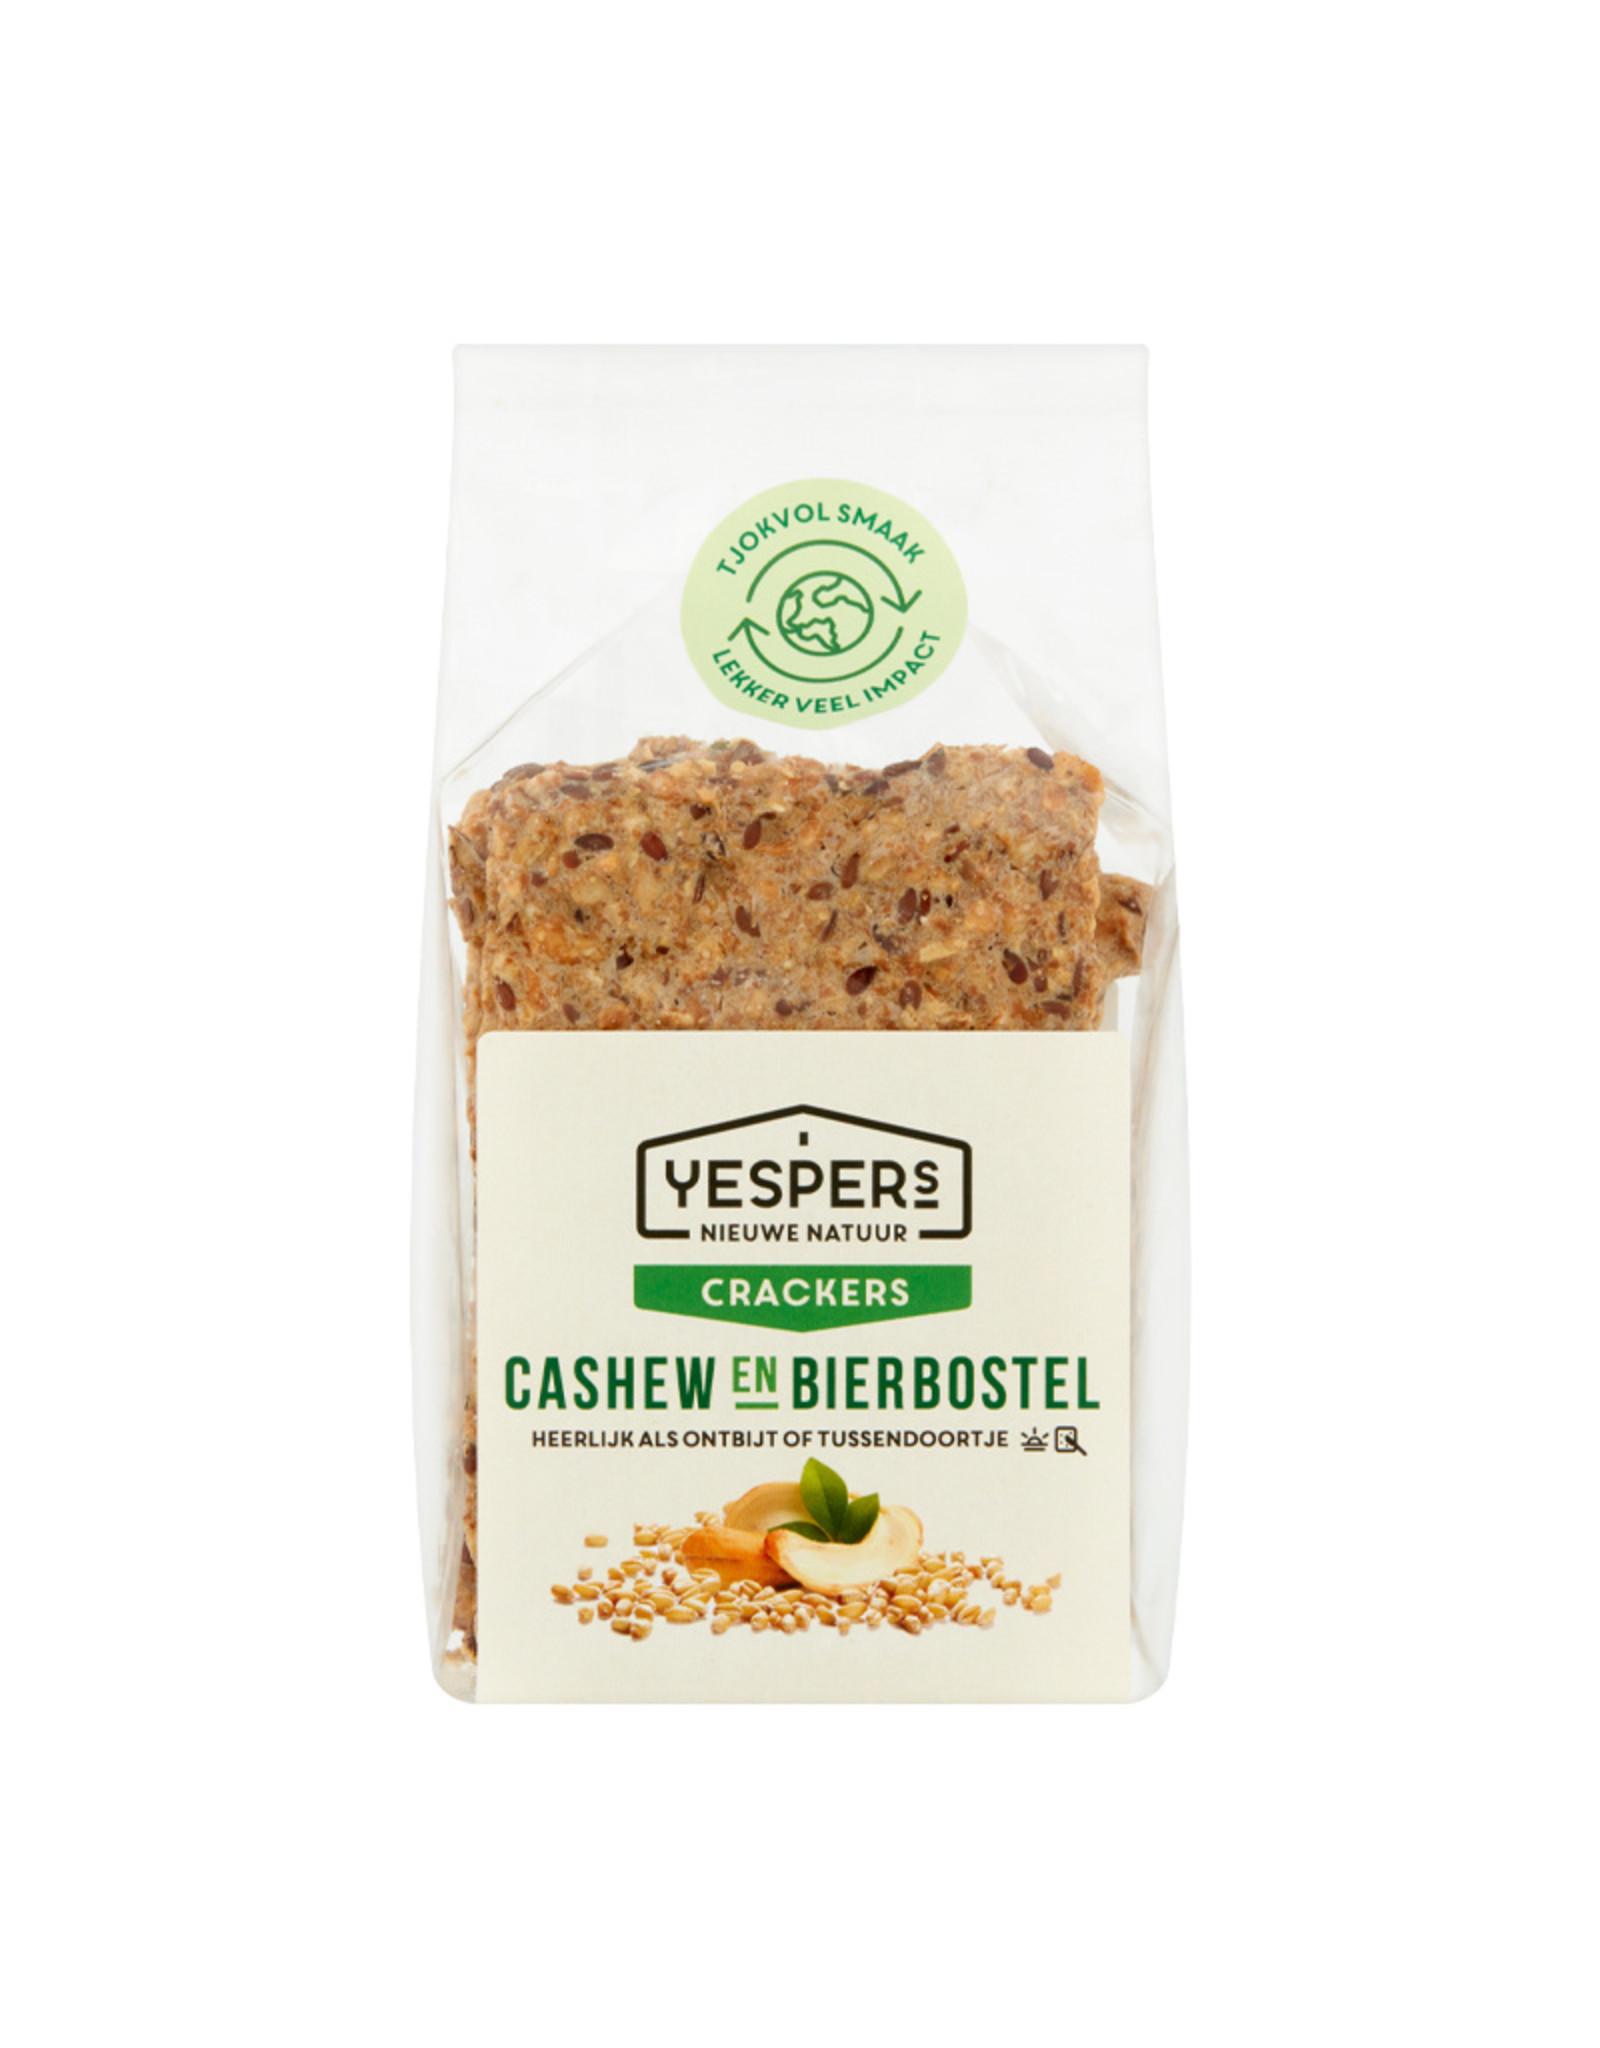 Yespers Crackers Cashew & bierbostel